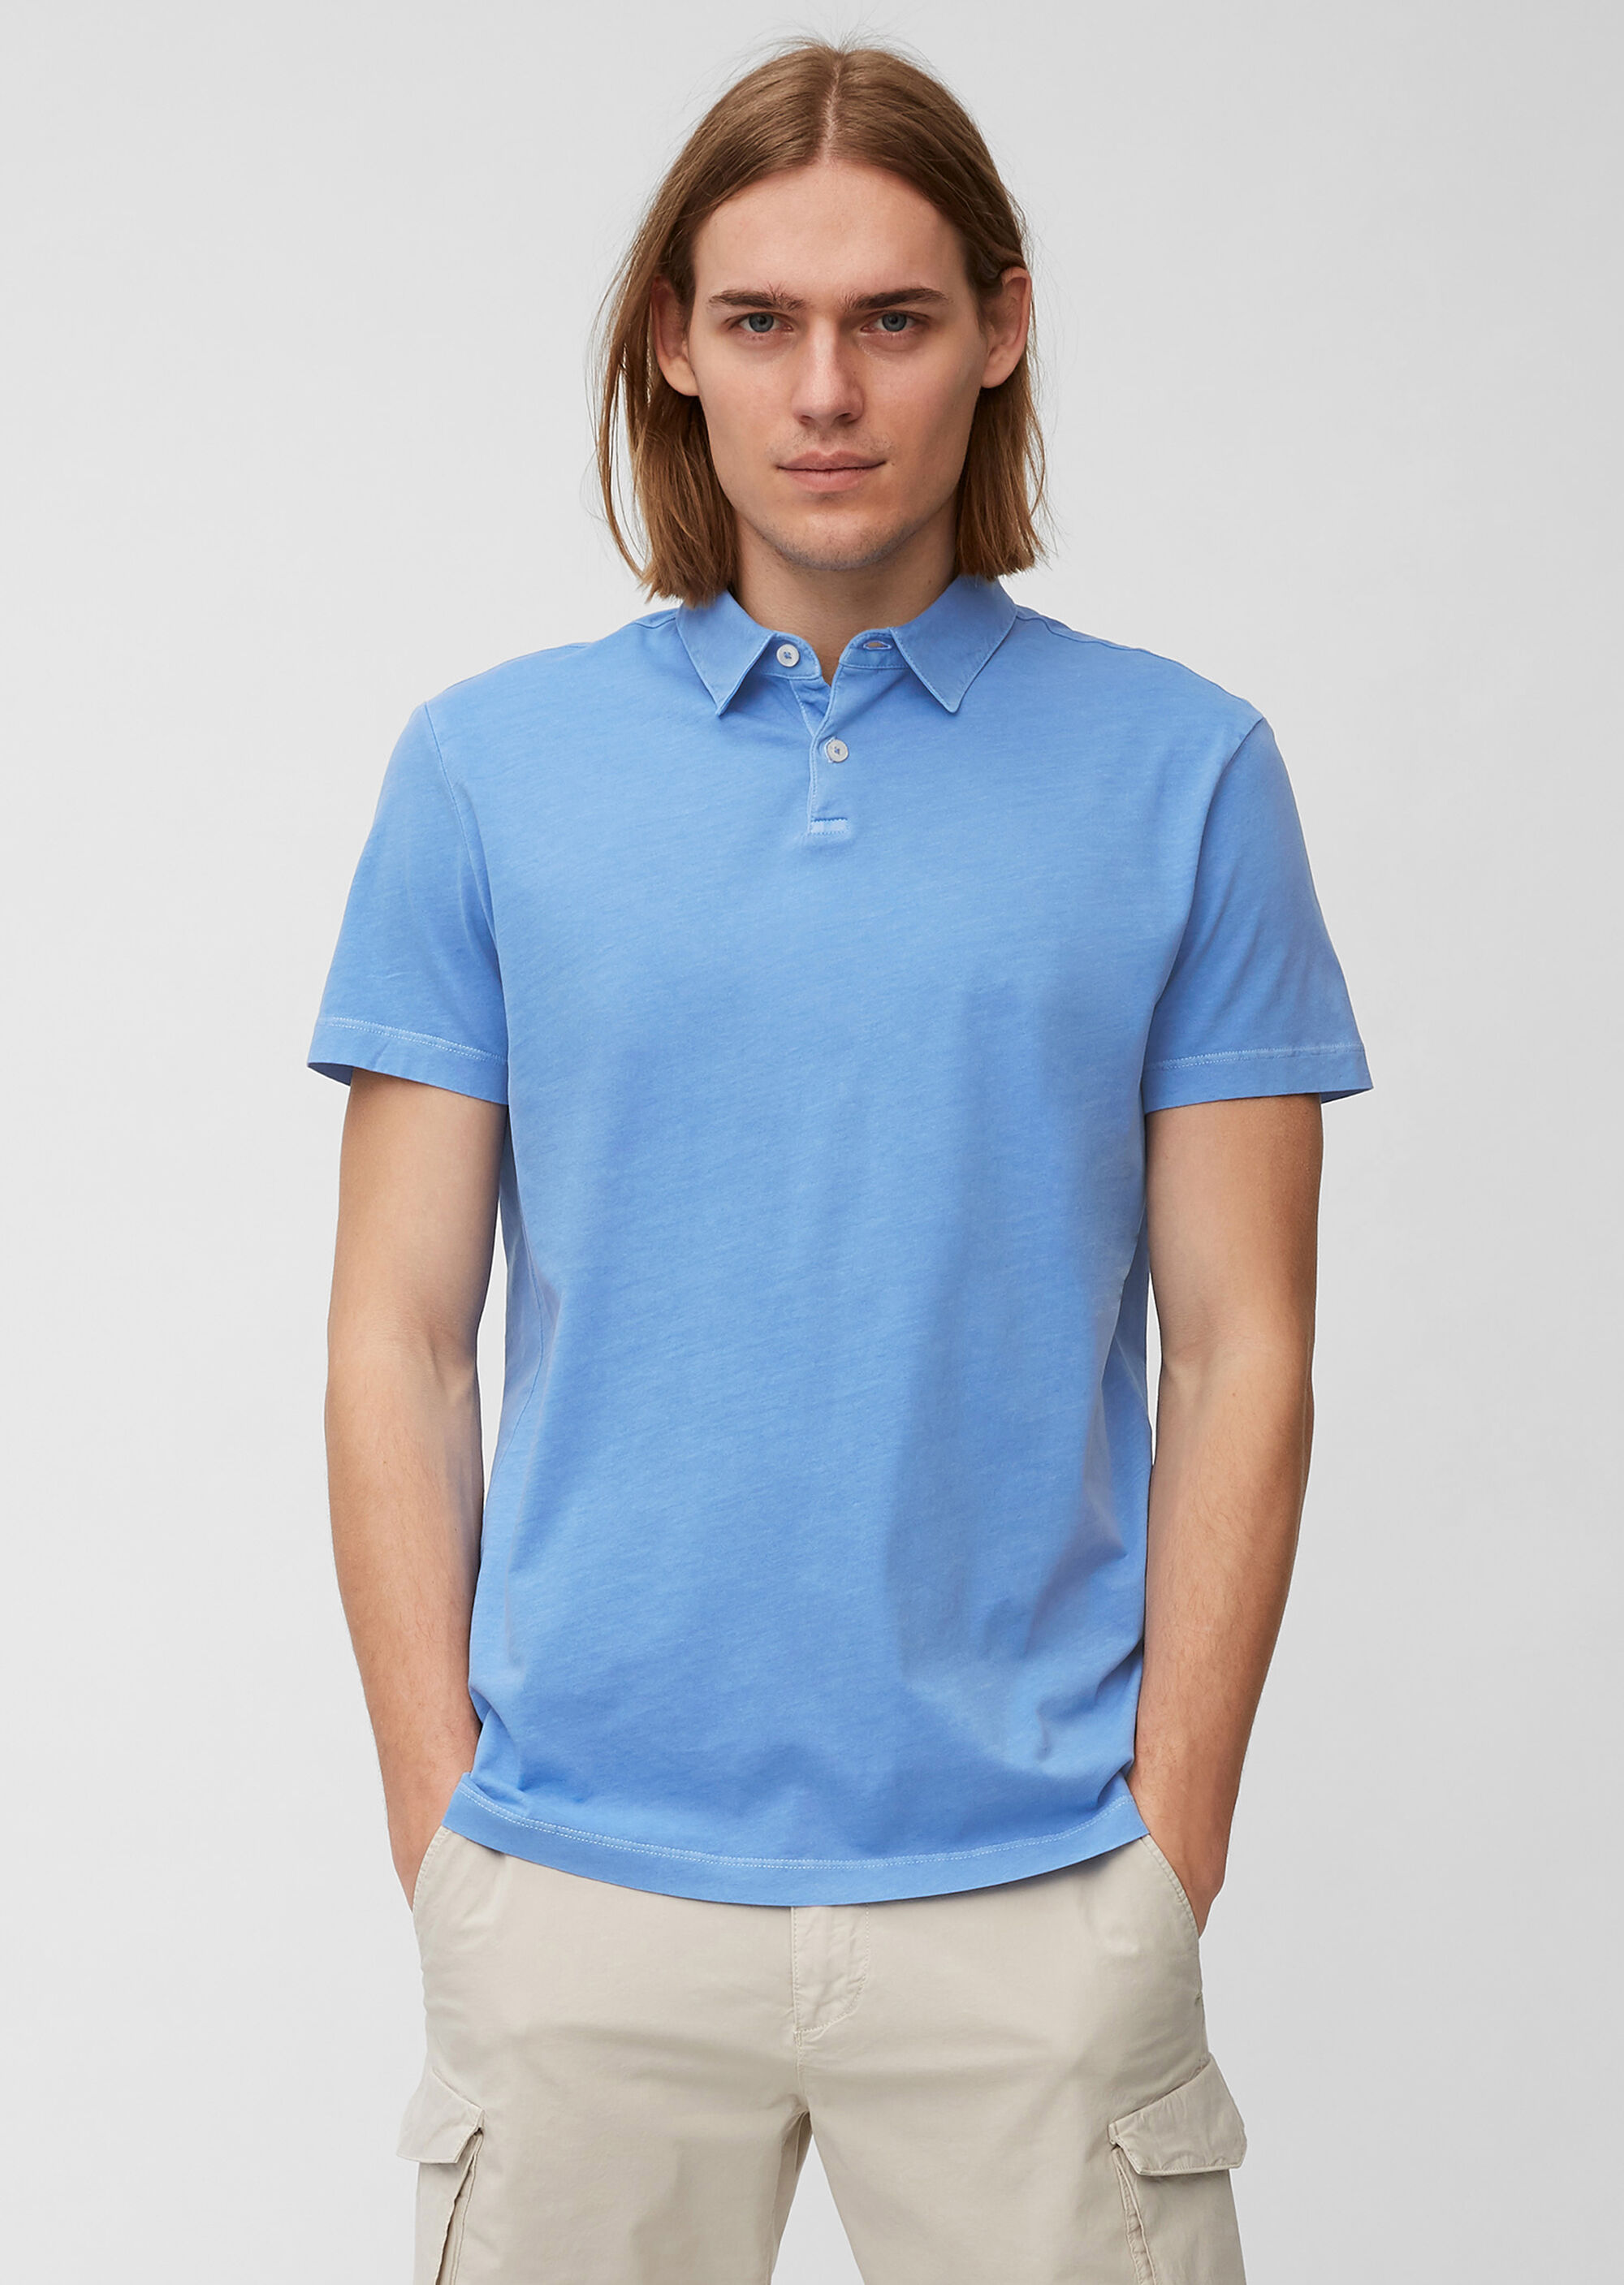 Kurzam-Polo-Shirt regular